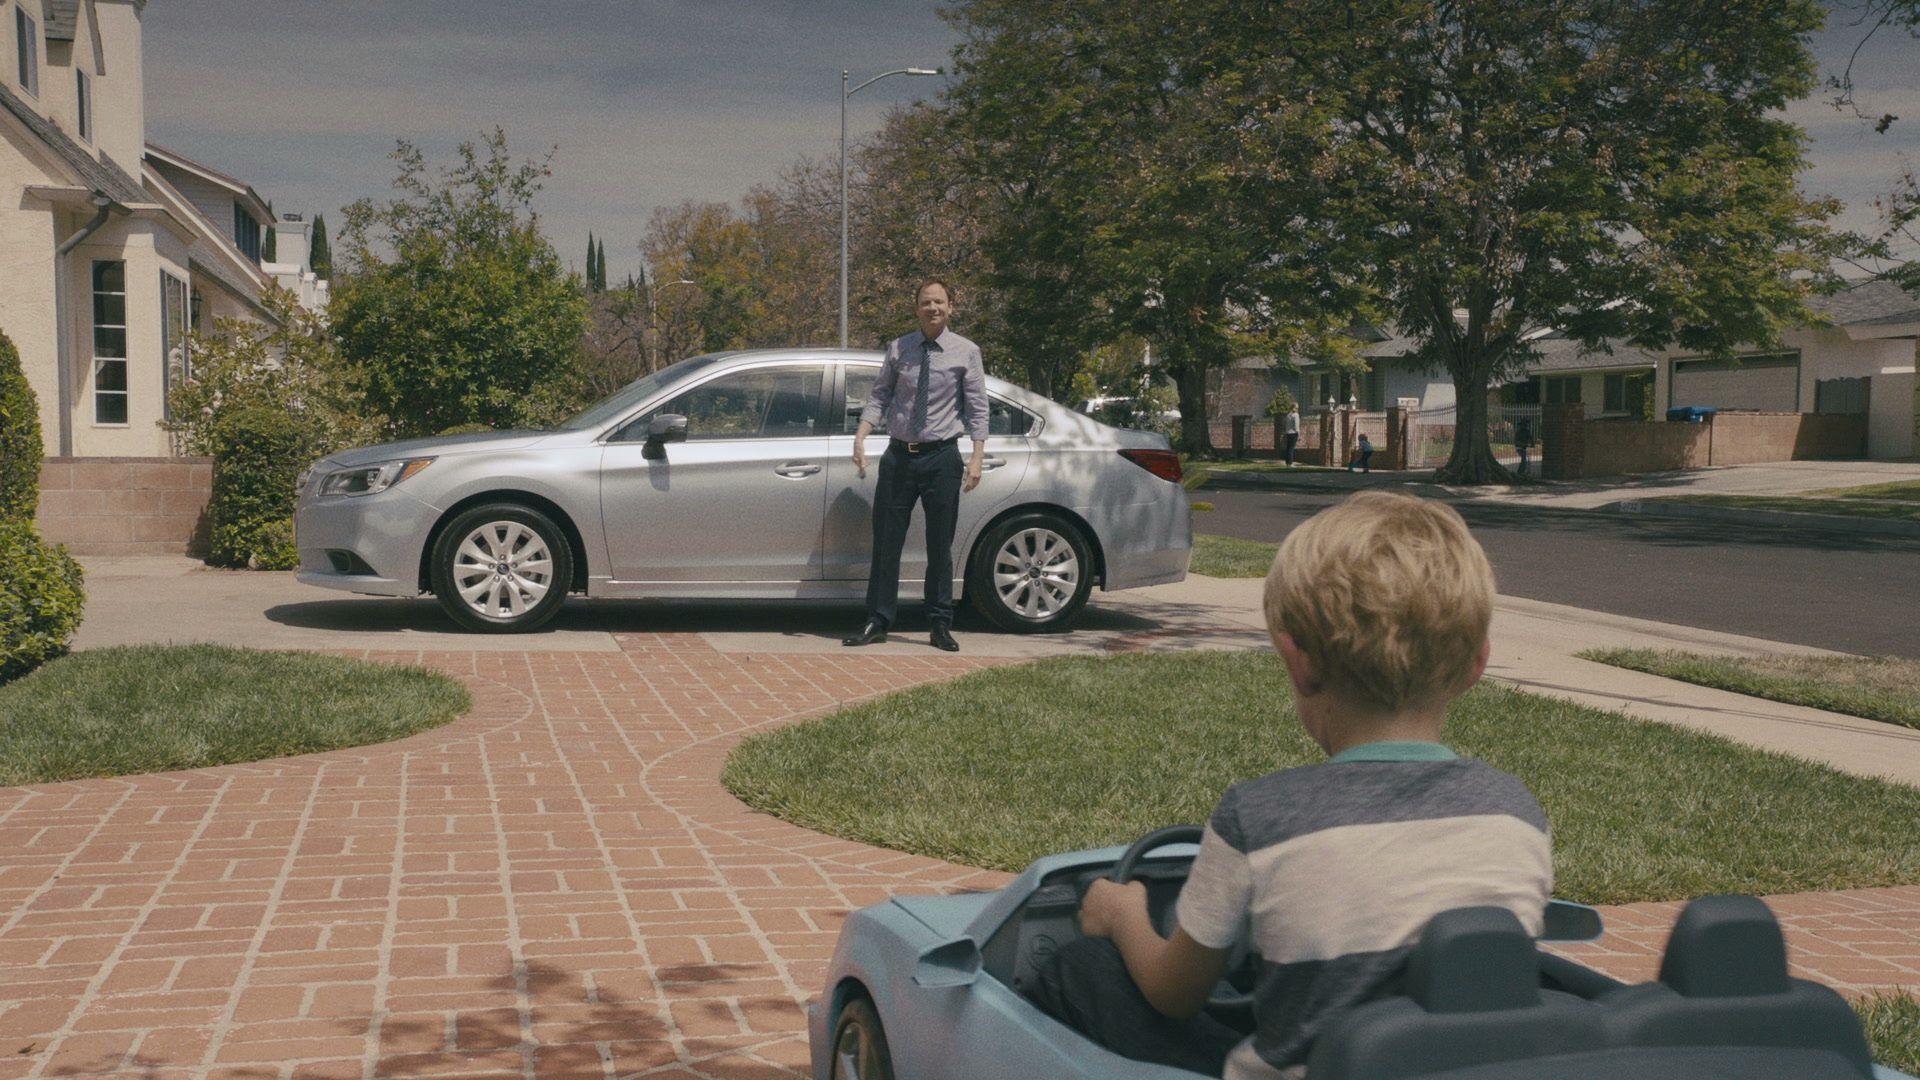 Sacramento Subaru Dealer Maita New Used Subaru Dealership Serving Auburn Roseville 2015 Subaru Legacy Subaru Legacy Subaru